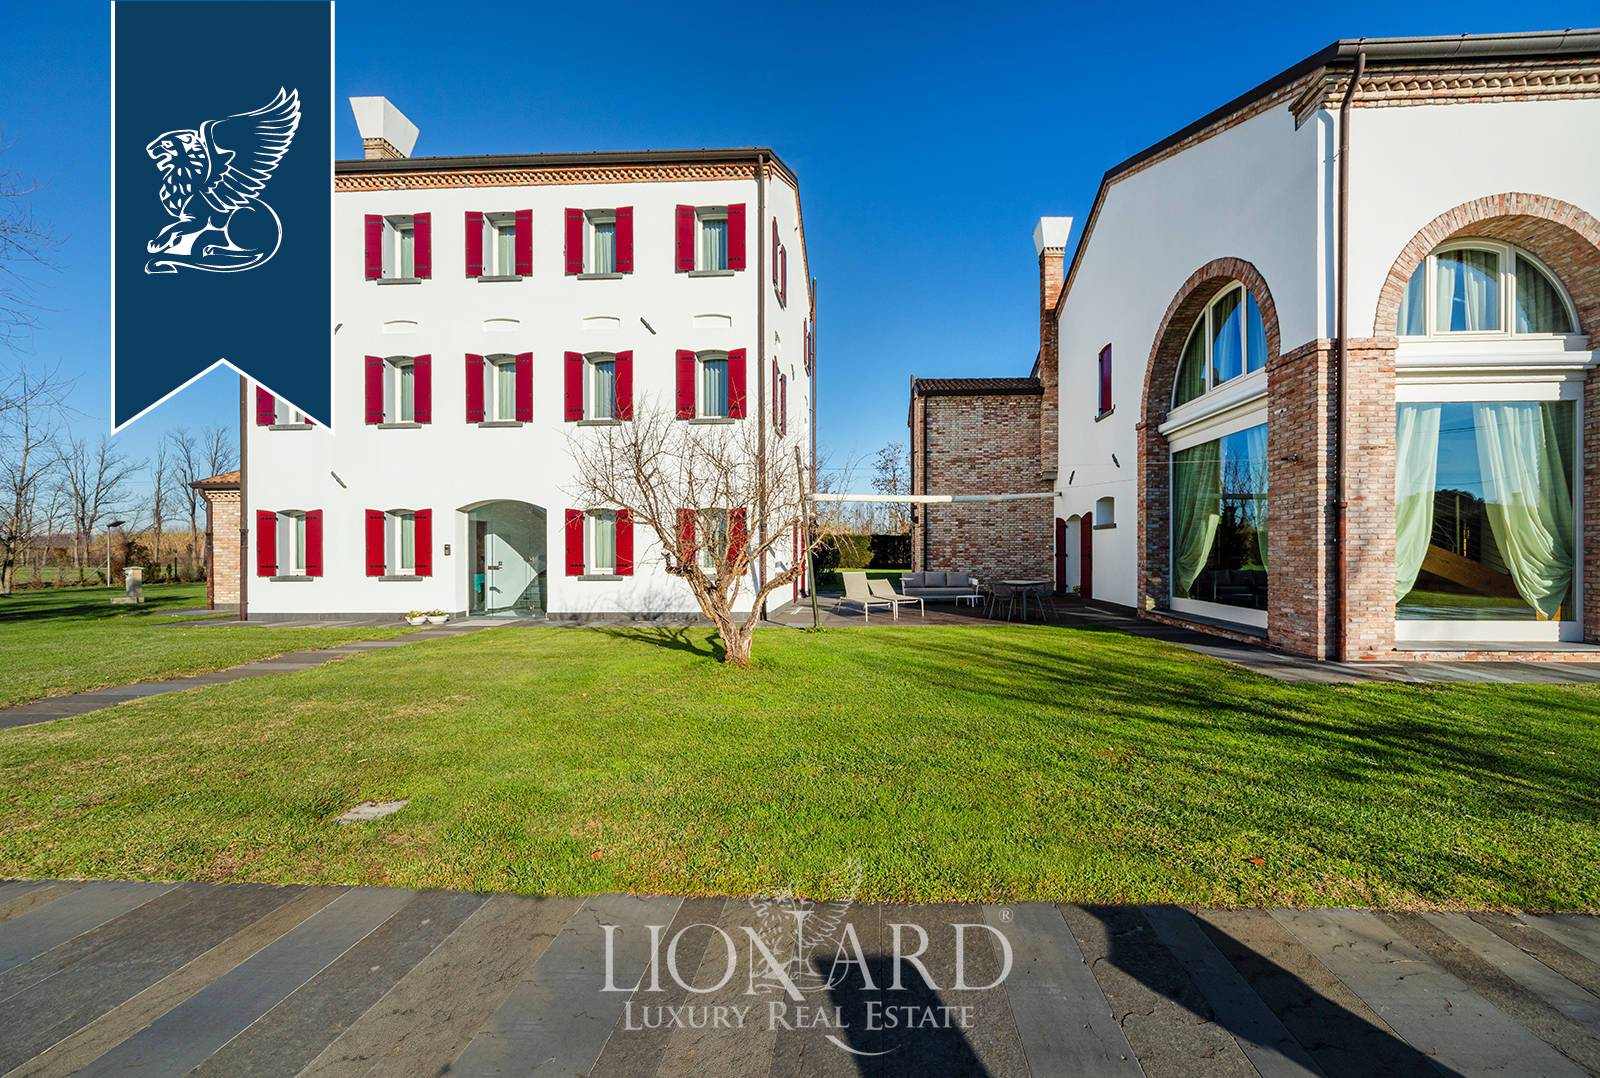 Rustico in Vendita a San Dona' Di Piave: 0 locali, 1000 mq - Foto 4